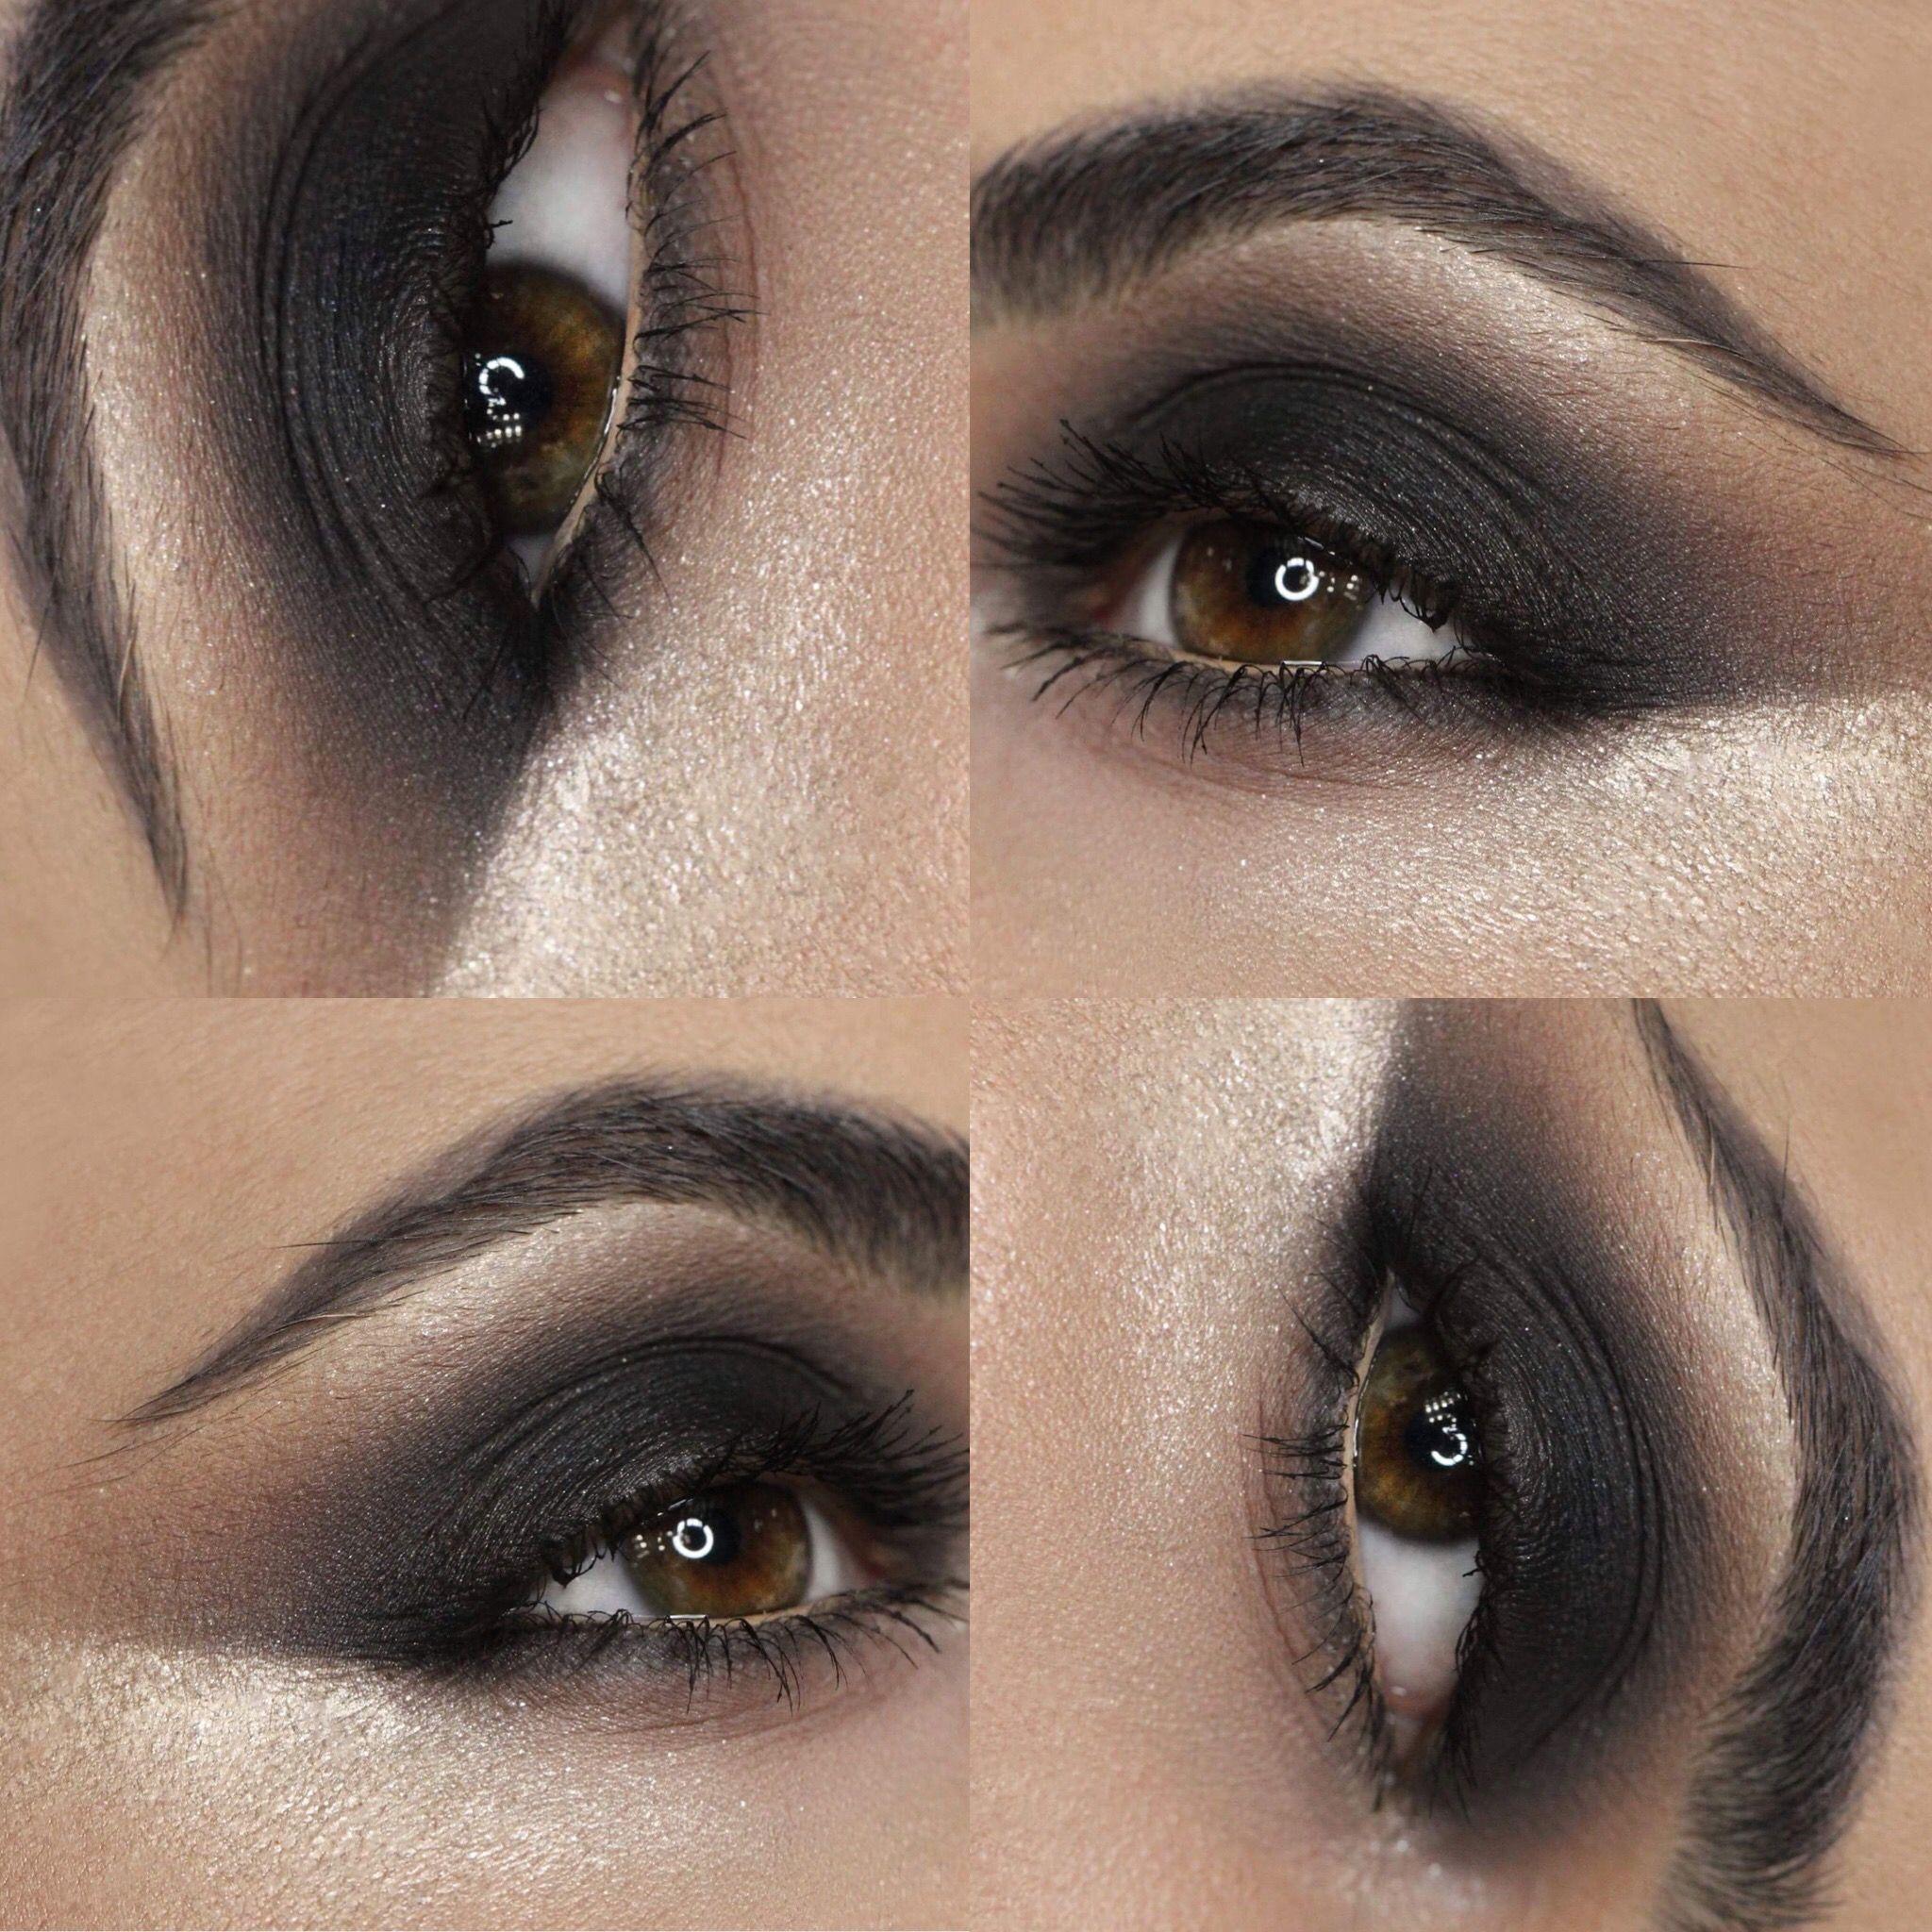 Pin by Iuliana Sandu on Eye Make-up Collage | Eye make ...